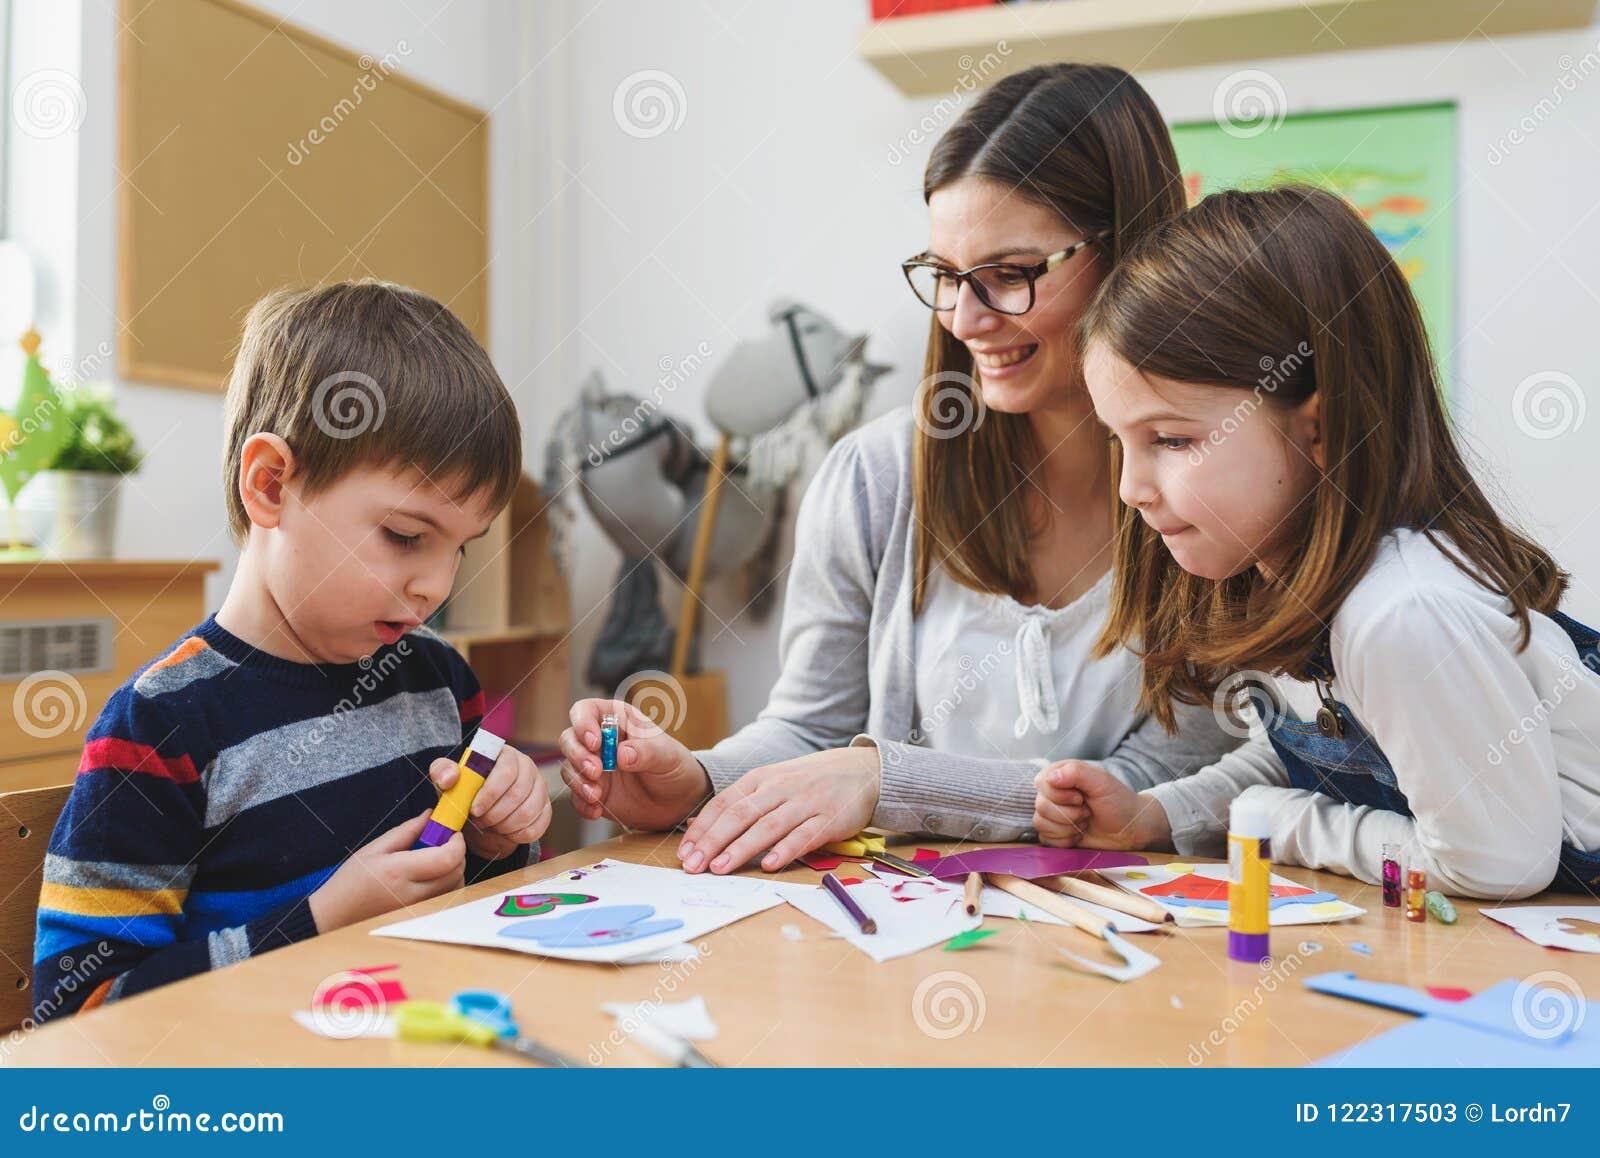 Vorschullehrer mit Kindern am Kindergarten - kreativer Art Class